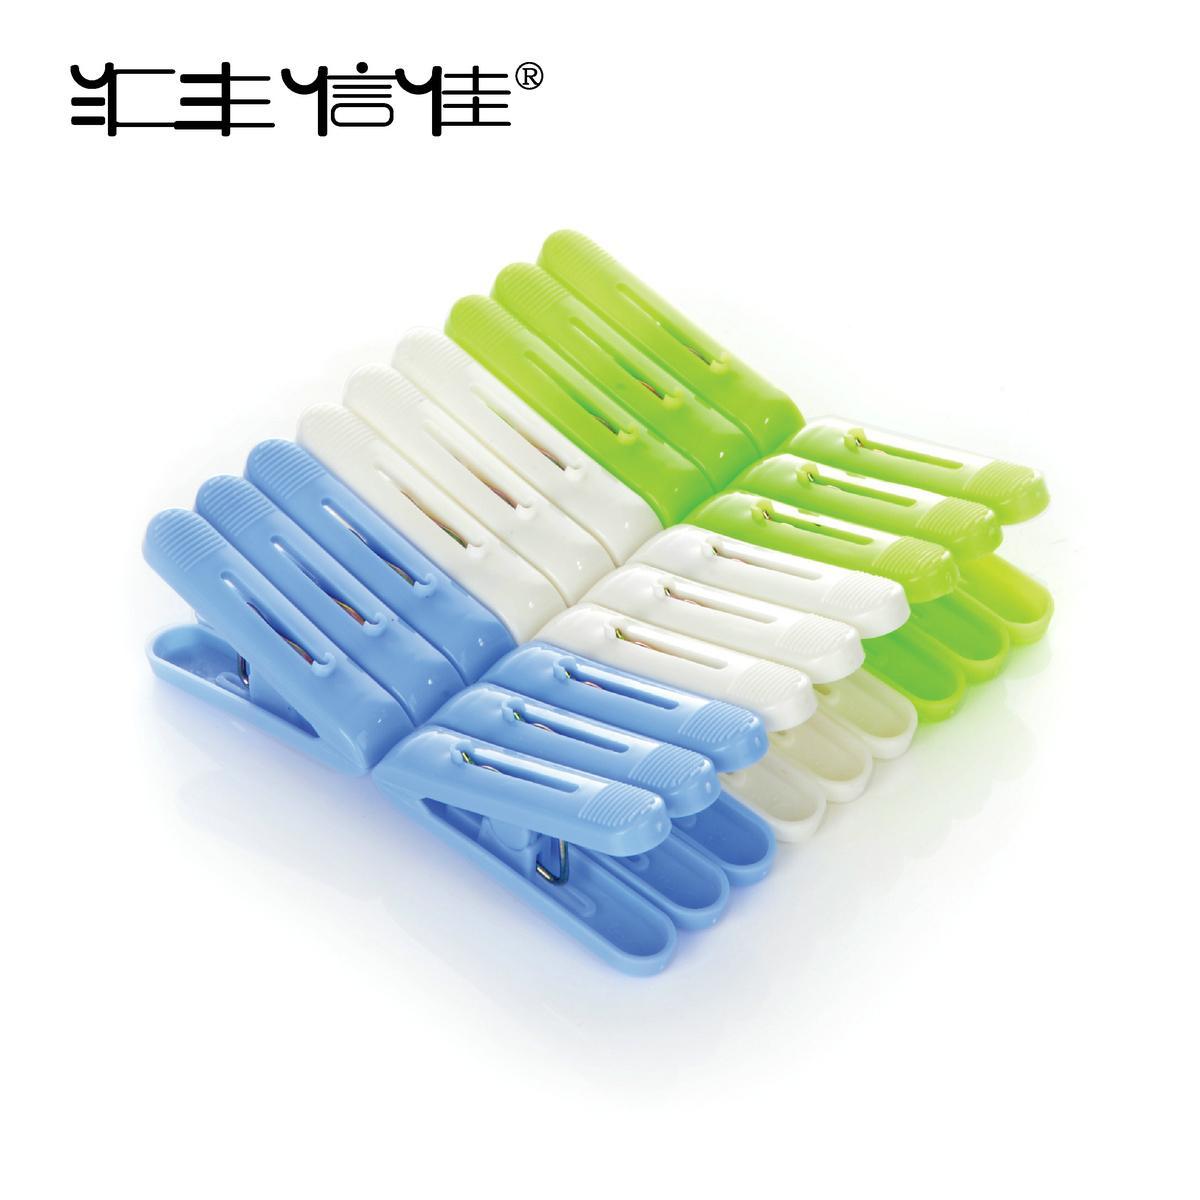 Buy Sell Cheapest Qanl Jepit Jemuran Best Quality Product Deals Hanger Ms Huifengxinjia Pakaian Plastik Klip Tahan Angin Catok Baju Jepitan Tas